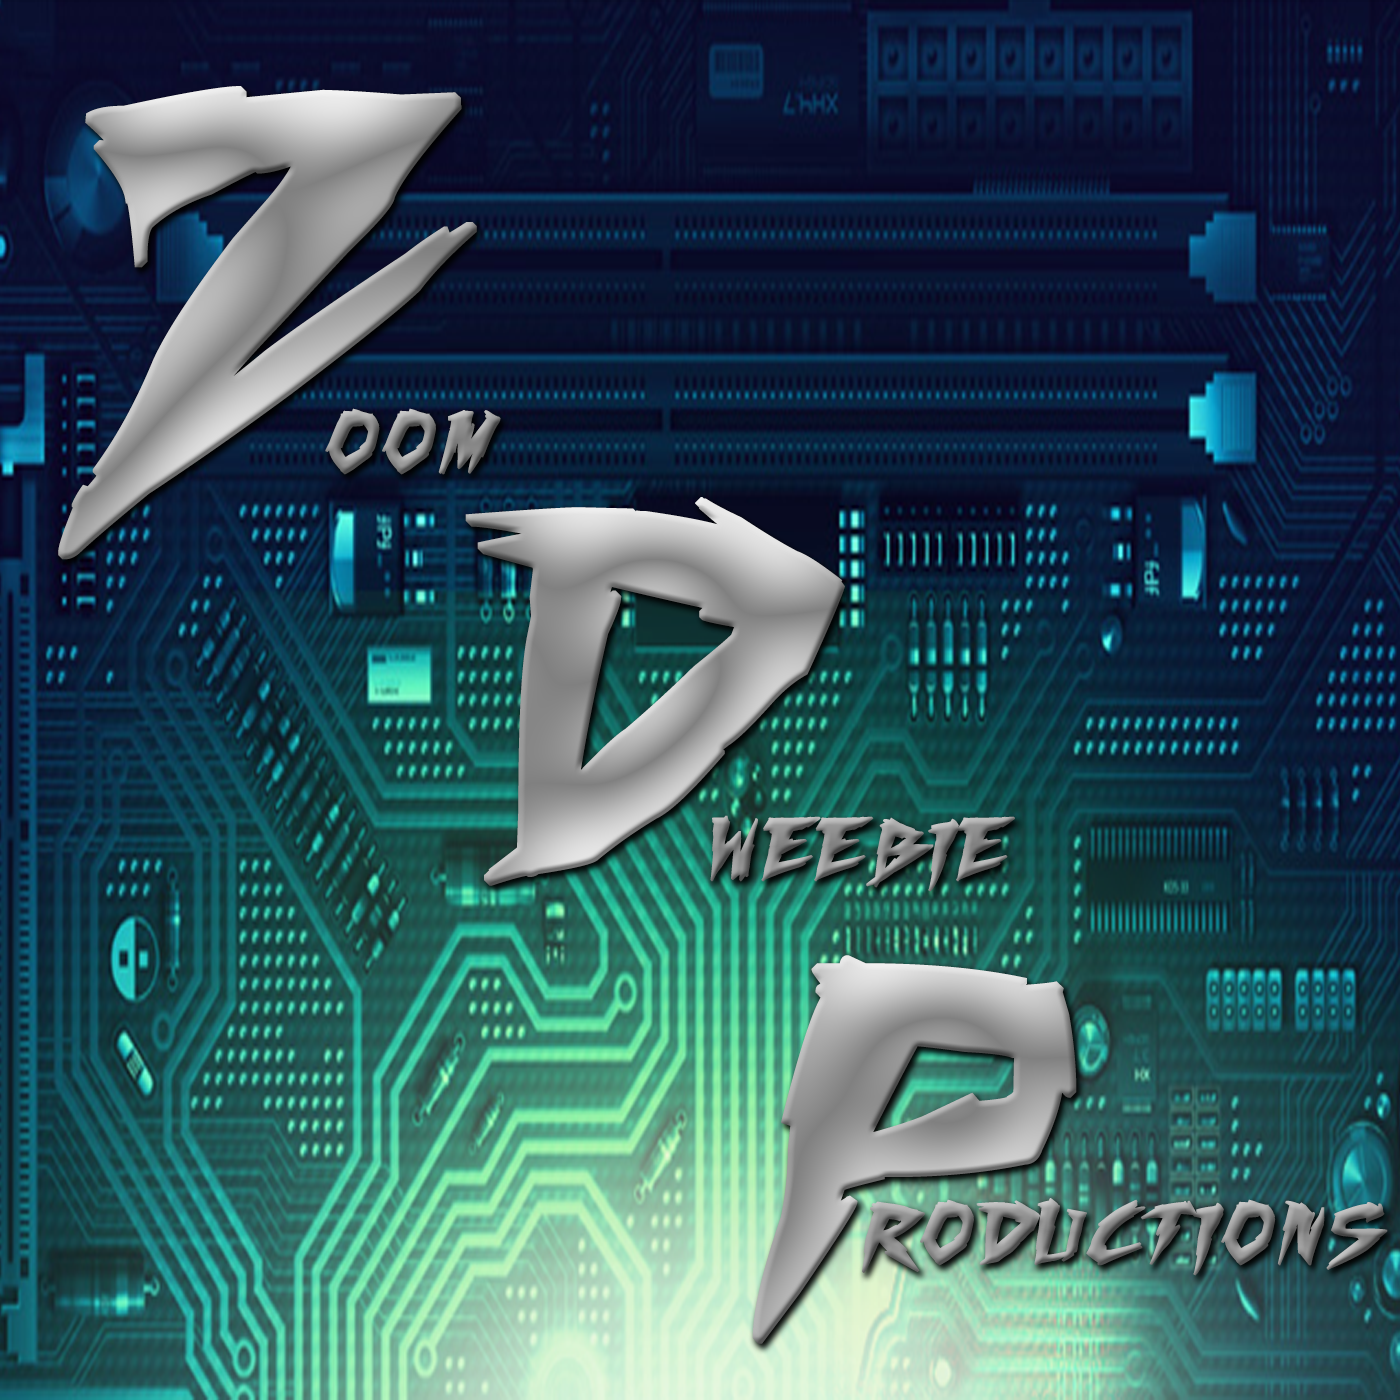 Zoom Dweebie Productions